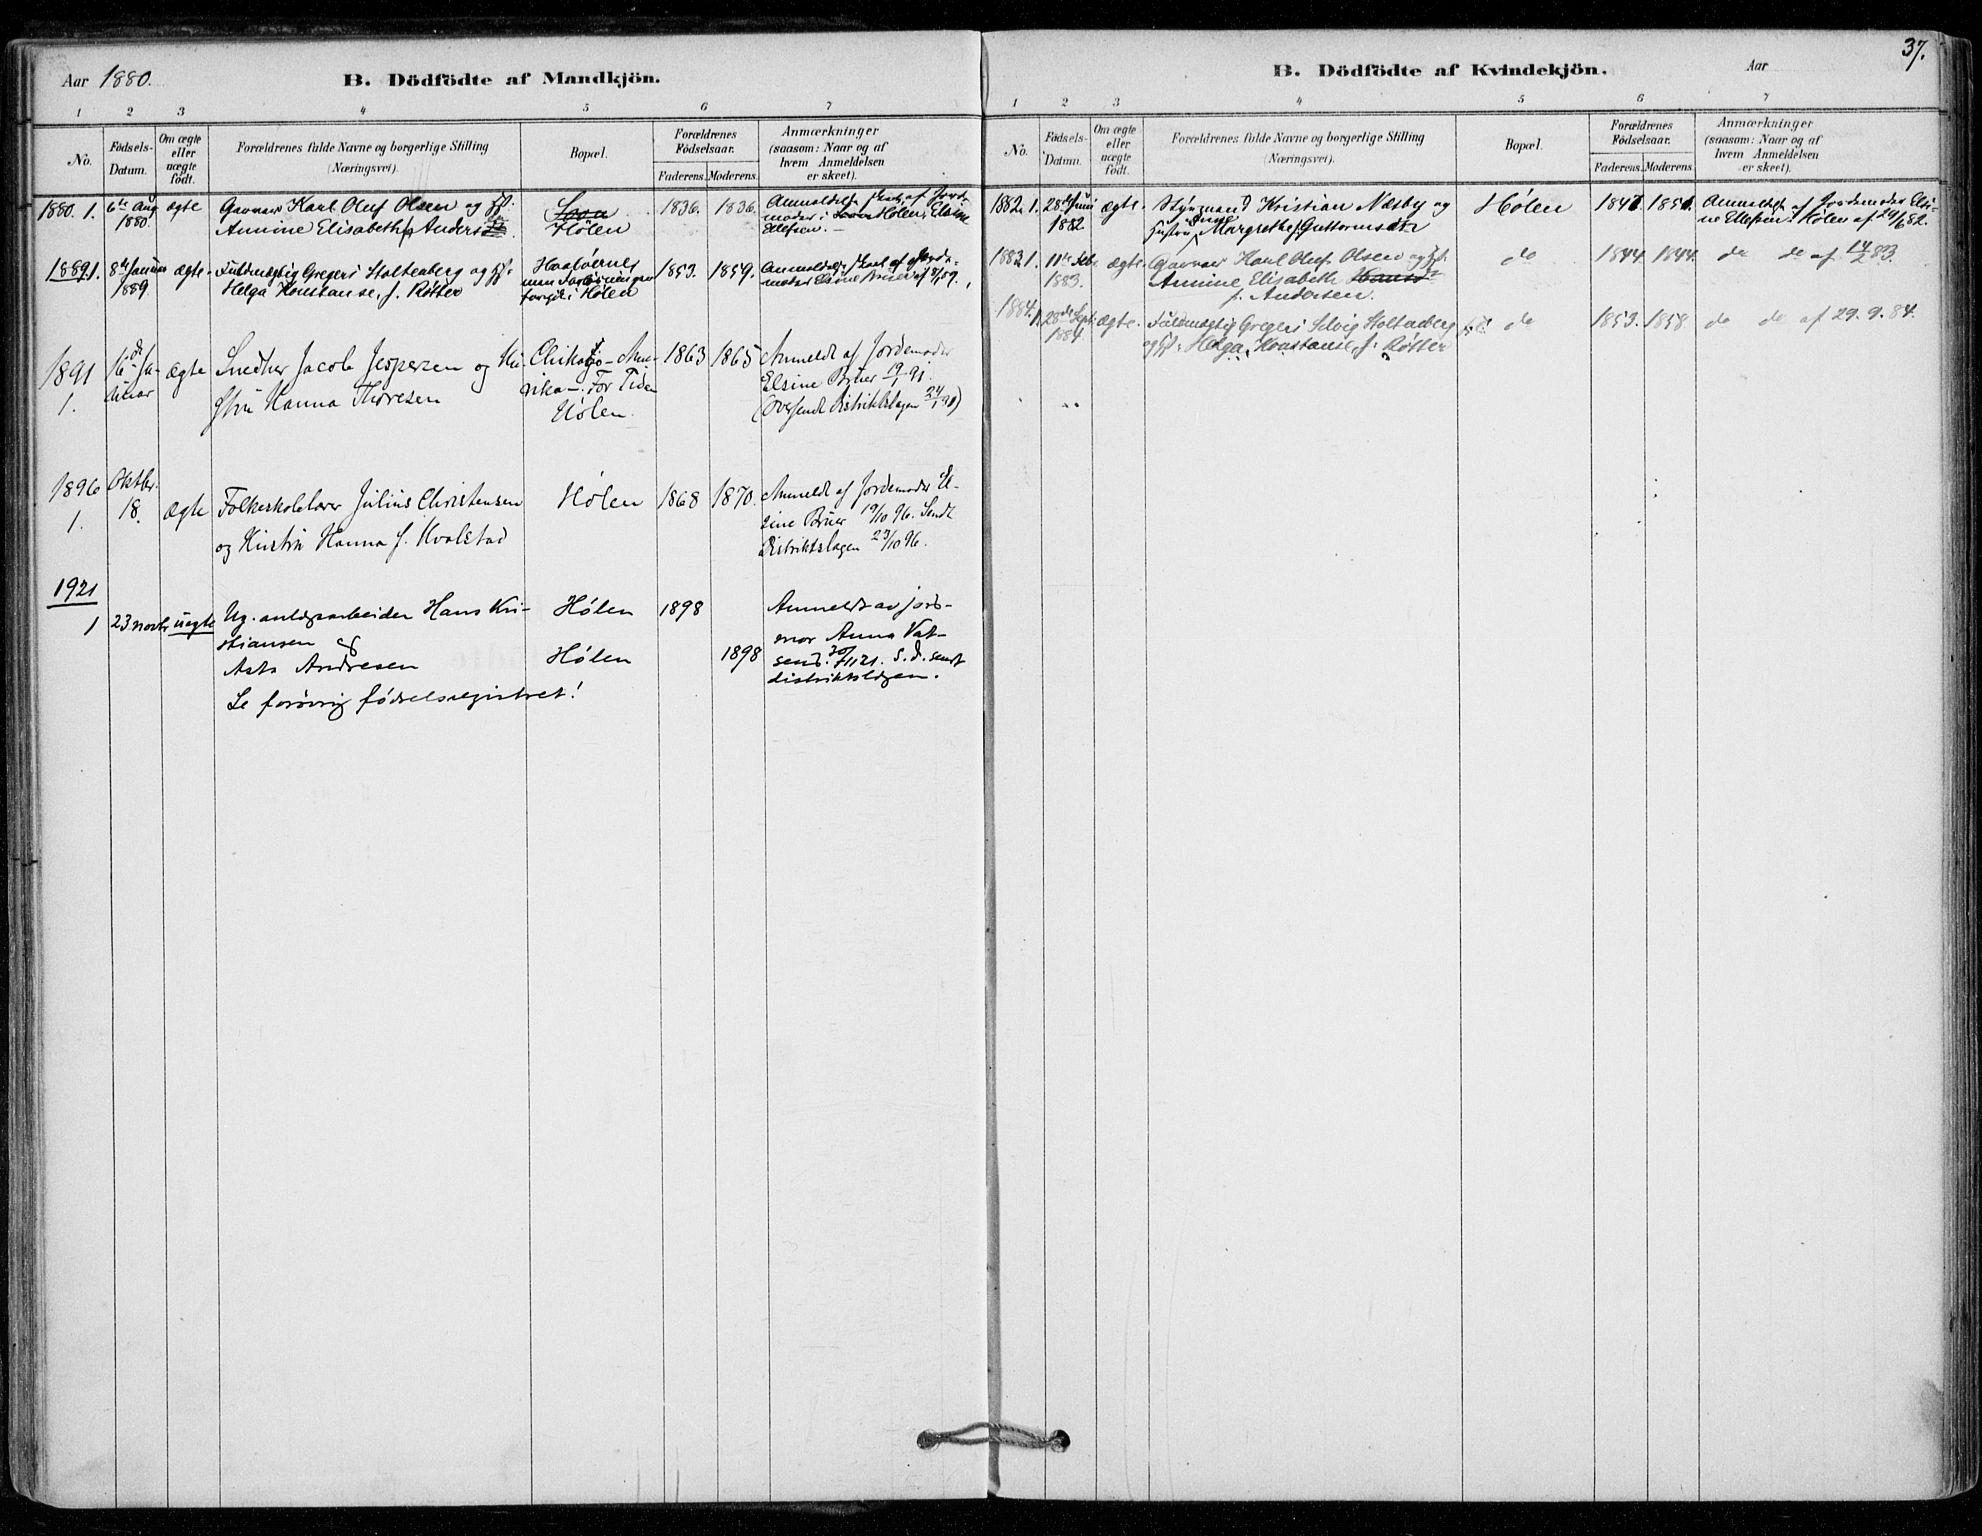 SAO, Vestby prestekontor Kirkebøker, F/Fe/L0001: Ministerialbok nr. V 1, 1878-1931, s. 37